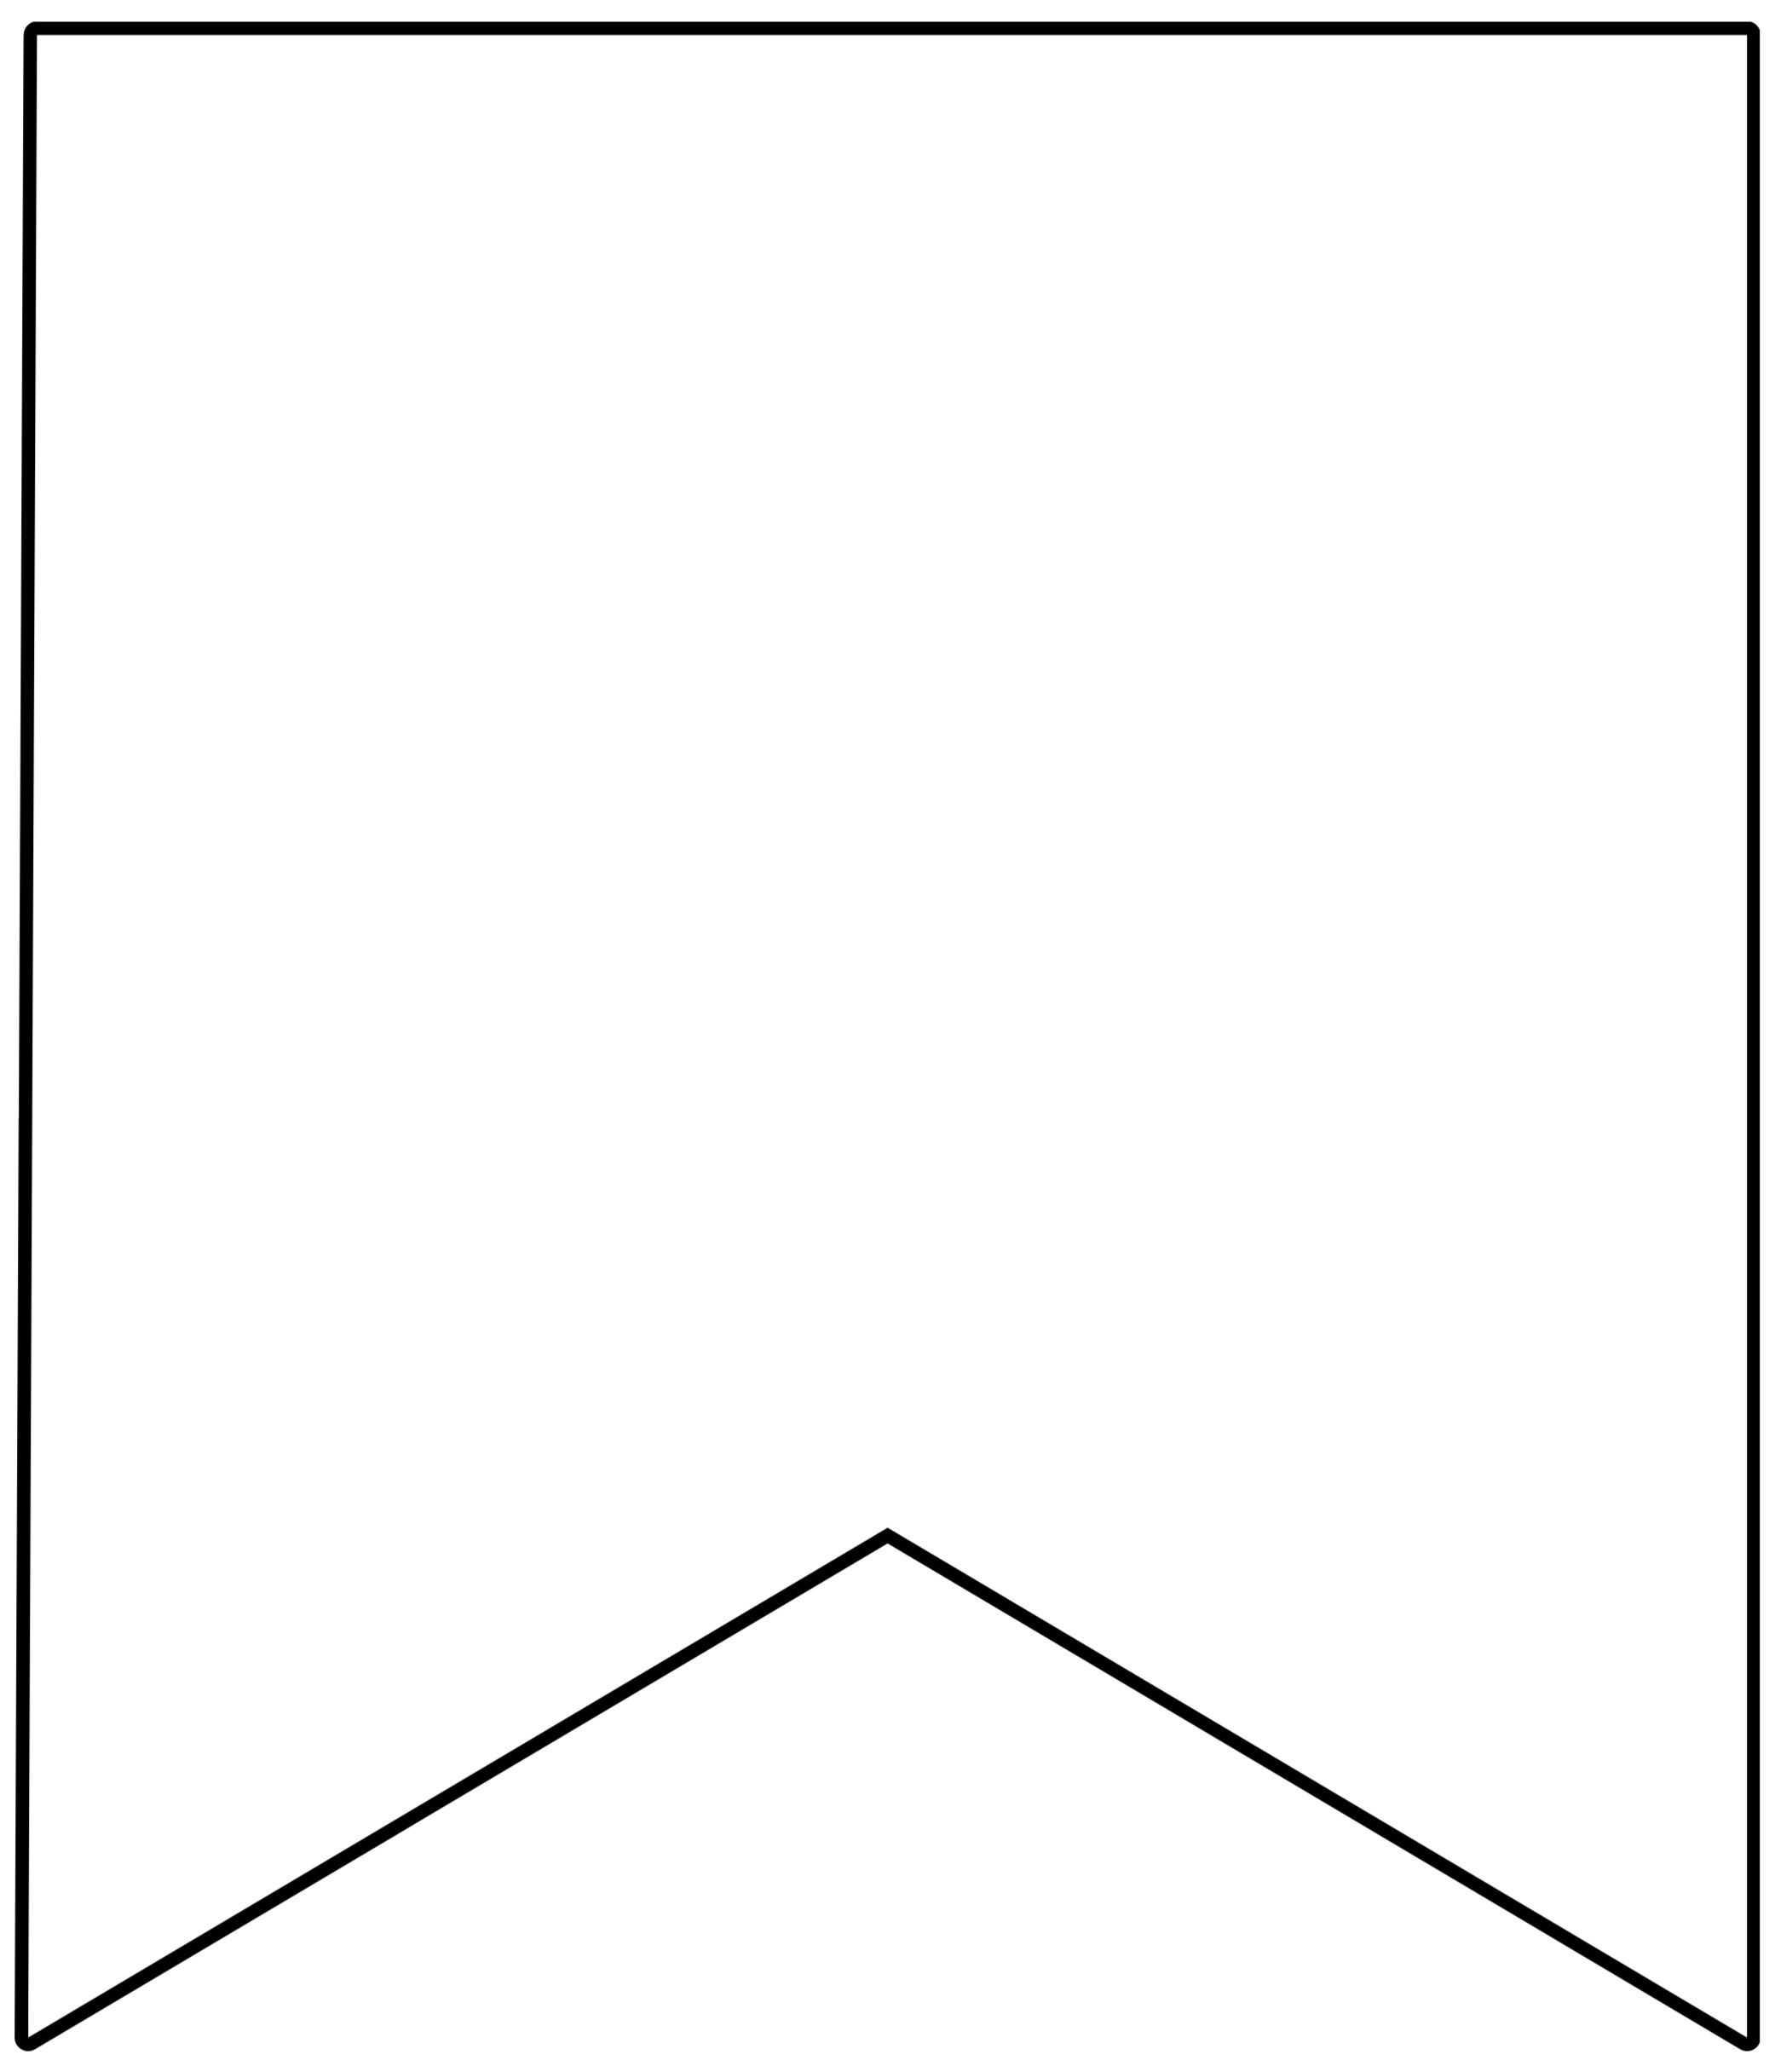 Template Printable Pennant Banner - Epp Acp | Free Within Free Printable Pennant Banner Template